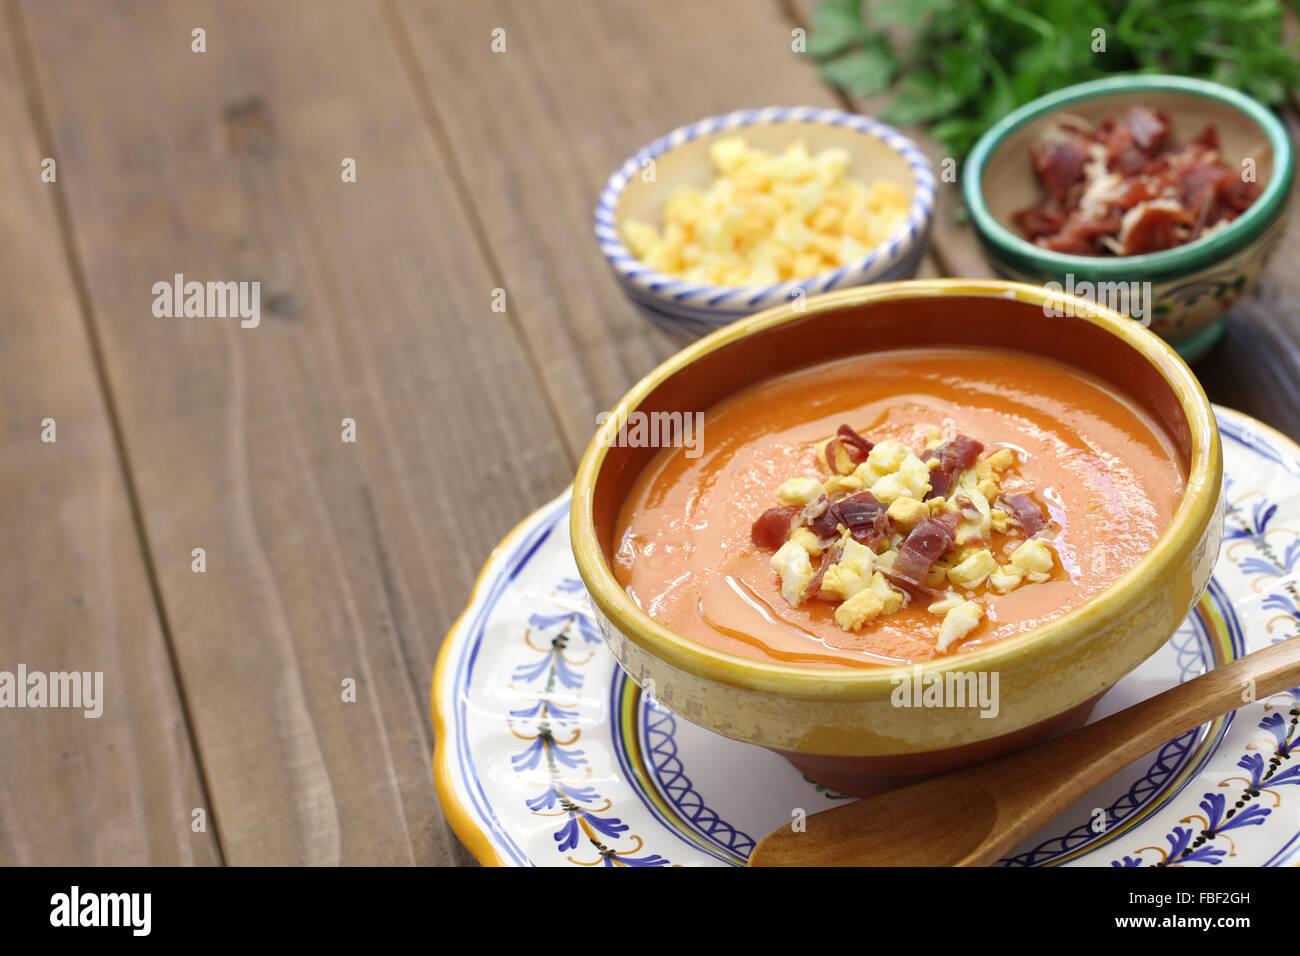 salmorejo, chilled tomato soup, spanish food - Stock Image